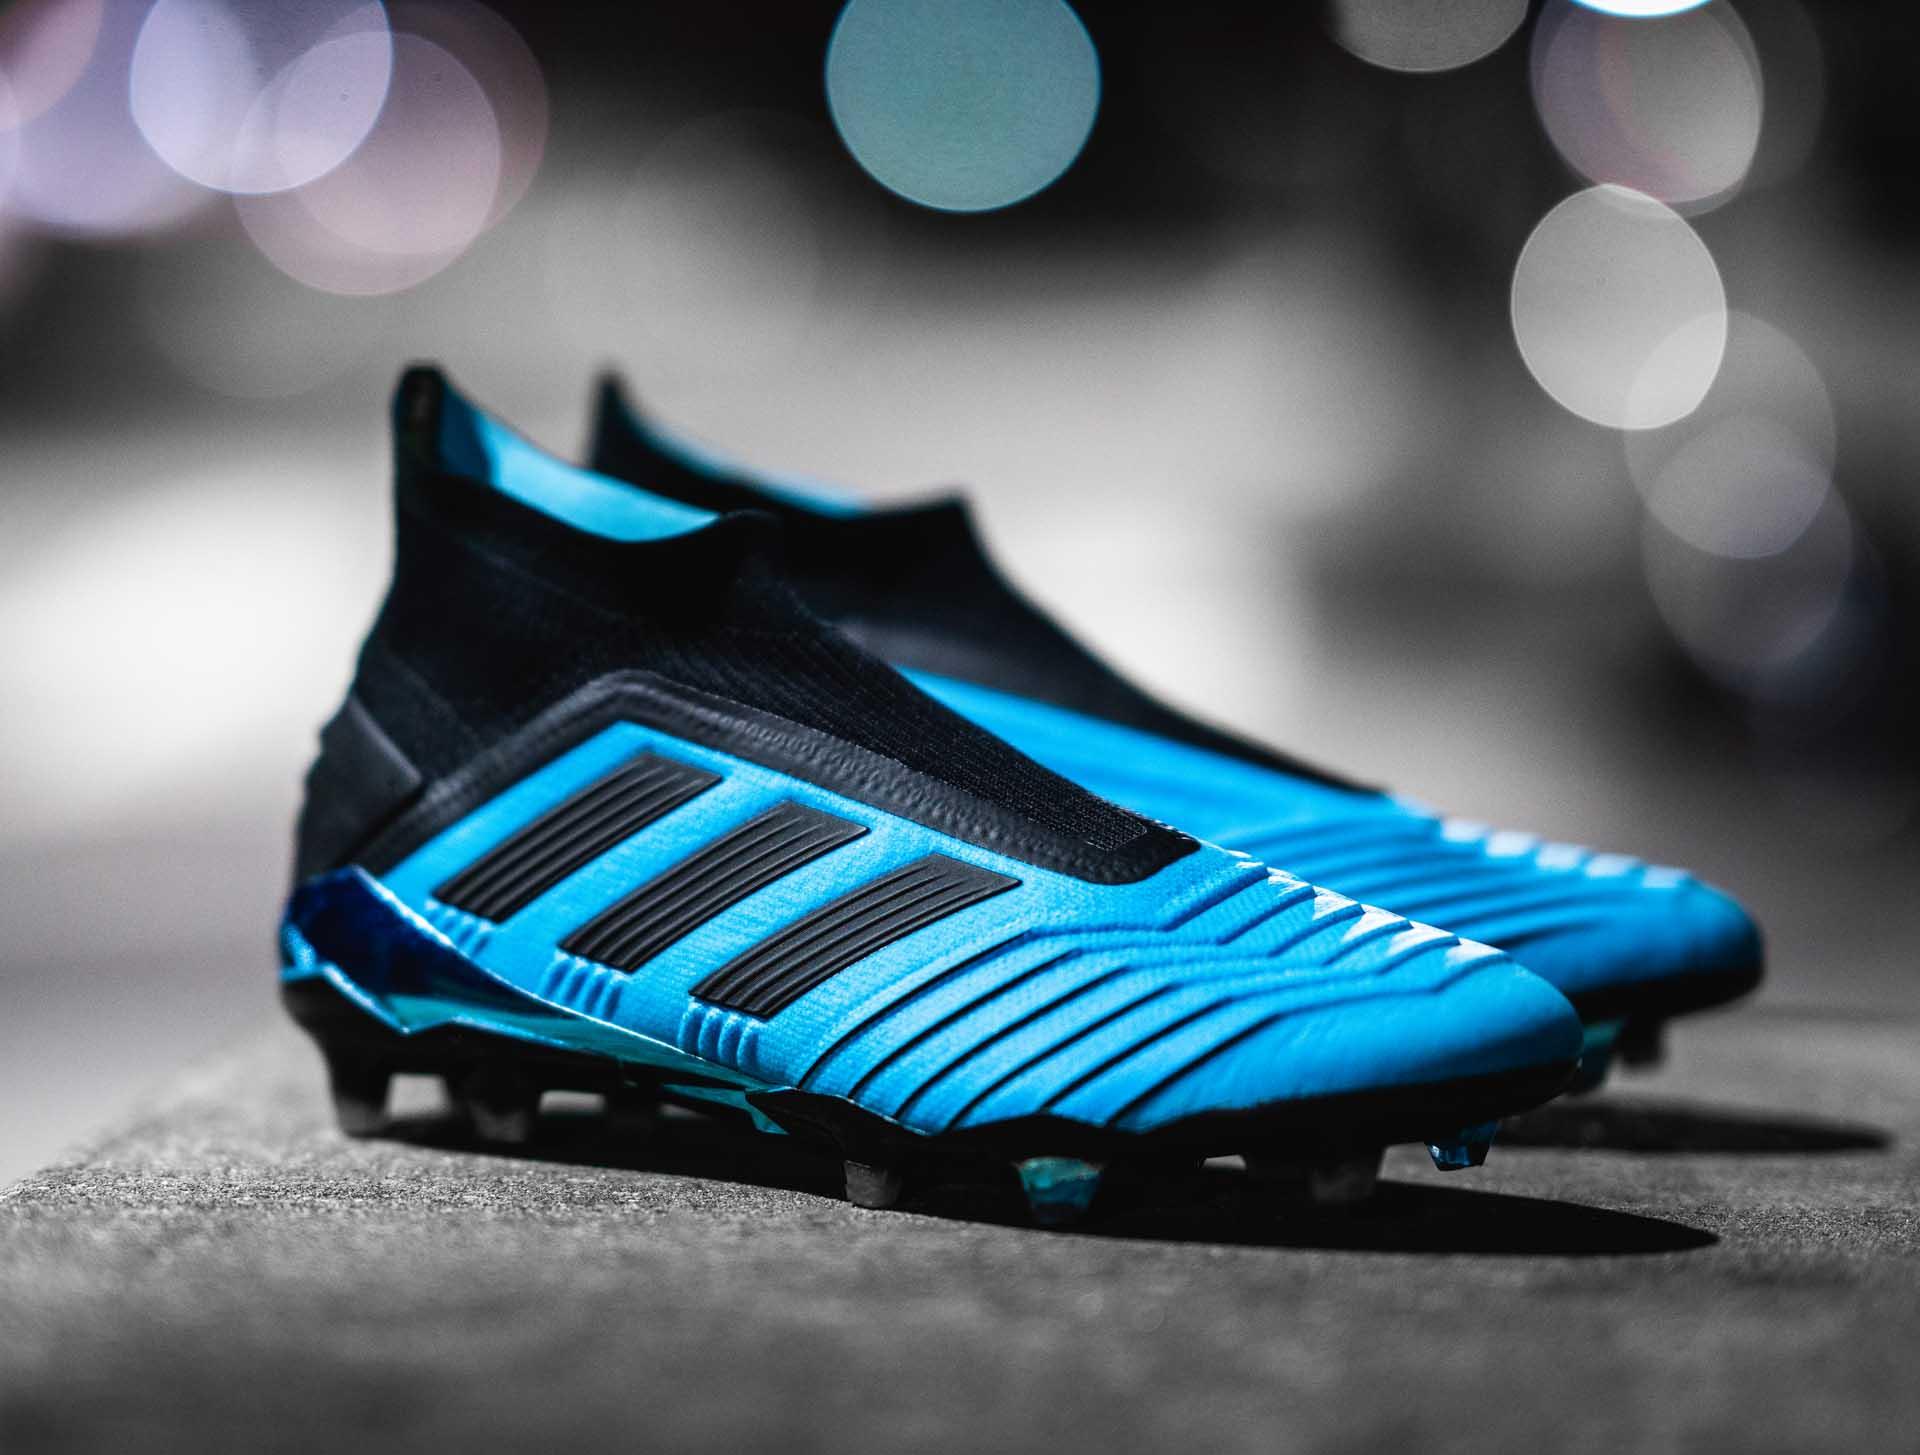 Chaussures De Chaussures Foot FootballPrixInfosNouveautésTest Inside ZTuwkOXPil